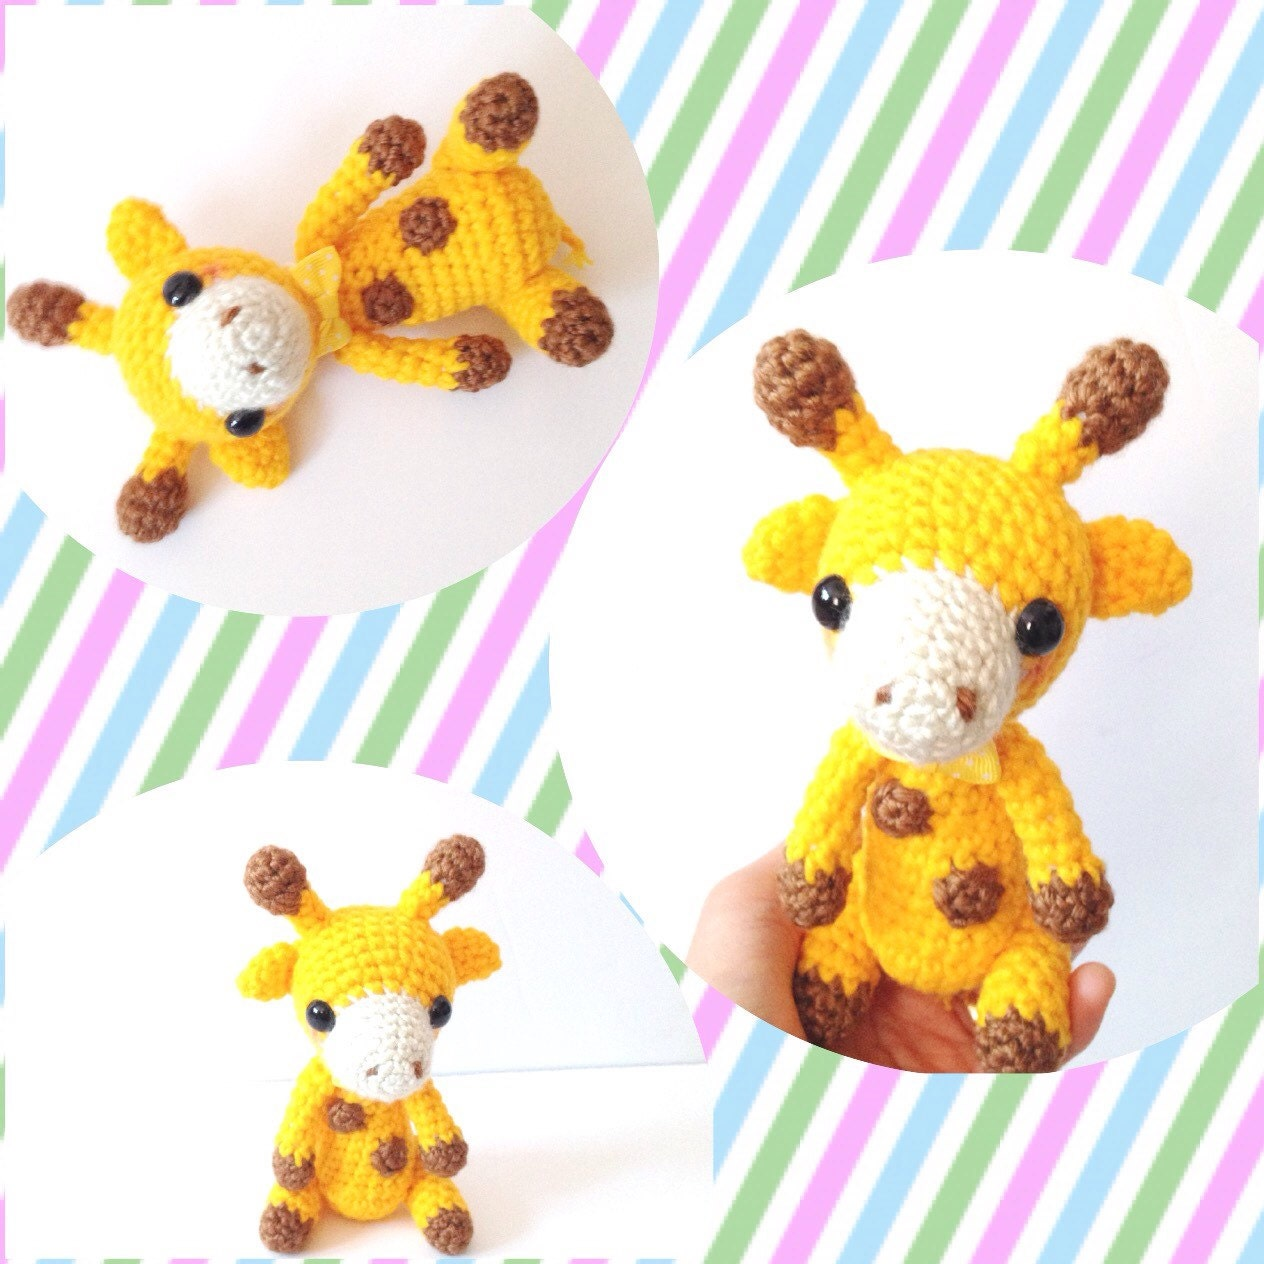 Cuddly Amigurumi Giraffe : Amigurumi Giraffe Crochet Giraffe Stuffed Animal Toy Giraffe